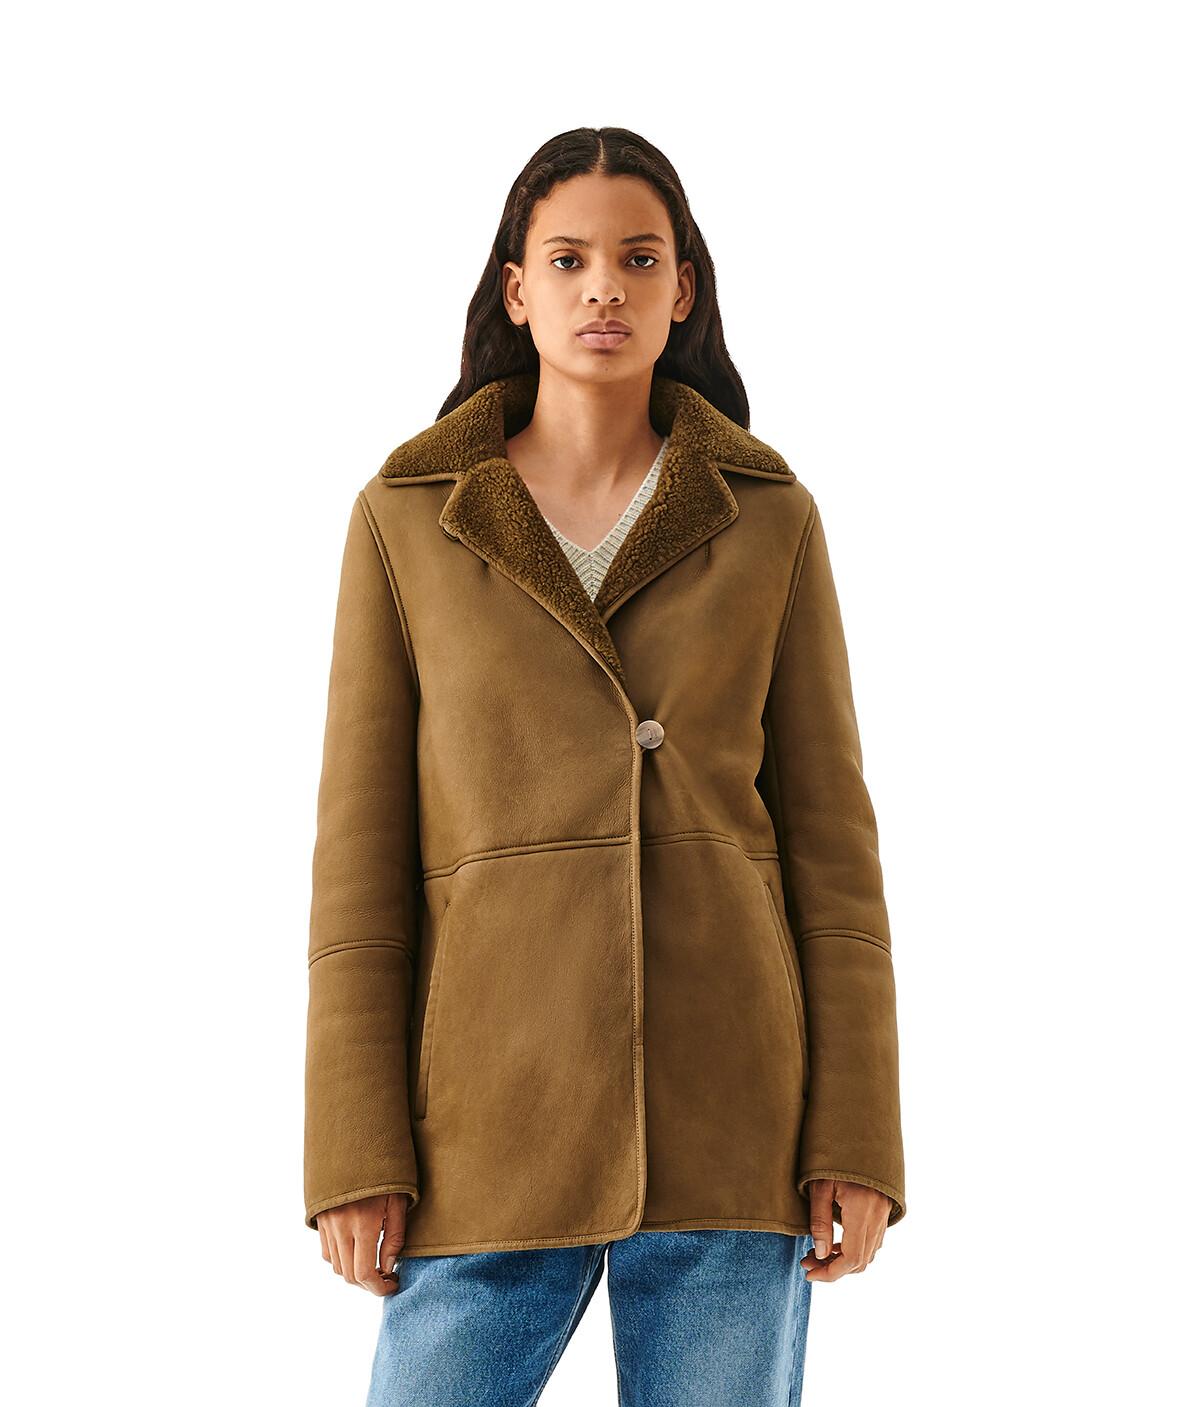 LOEWE Shearling Jacket Khaki Green front